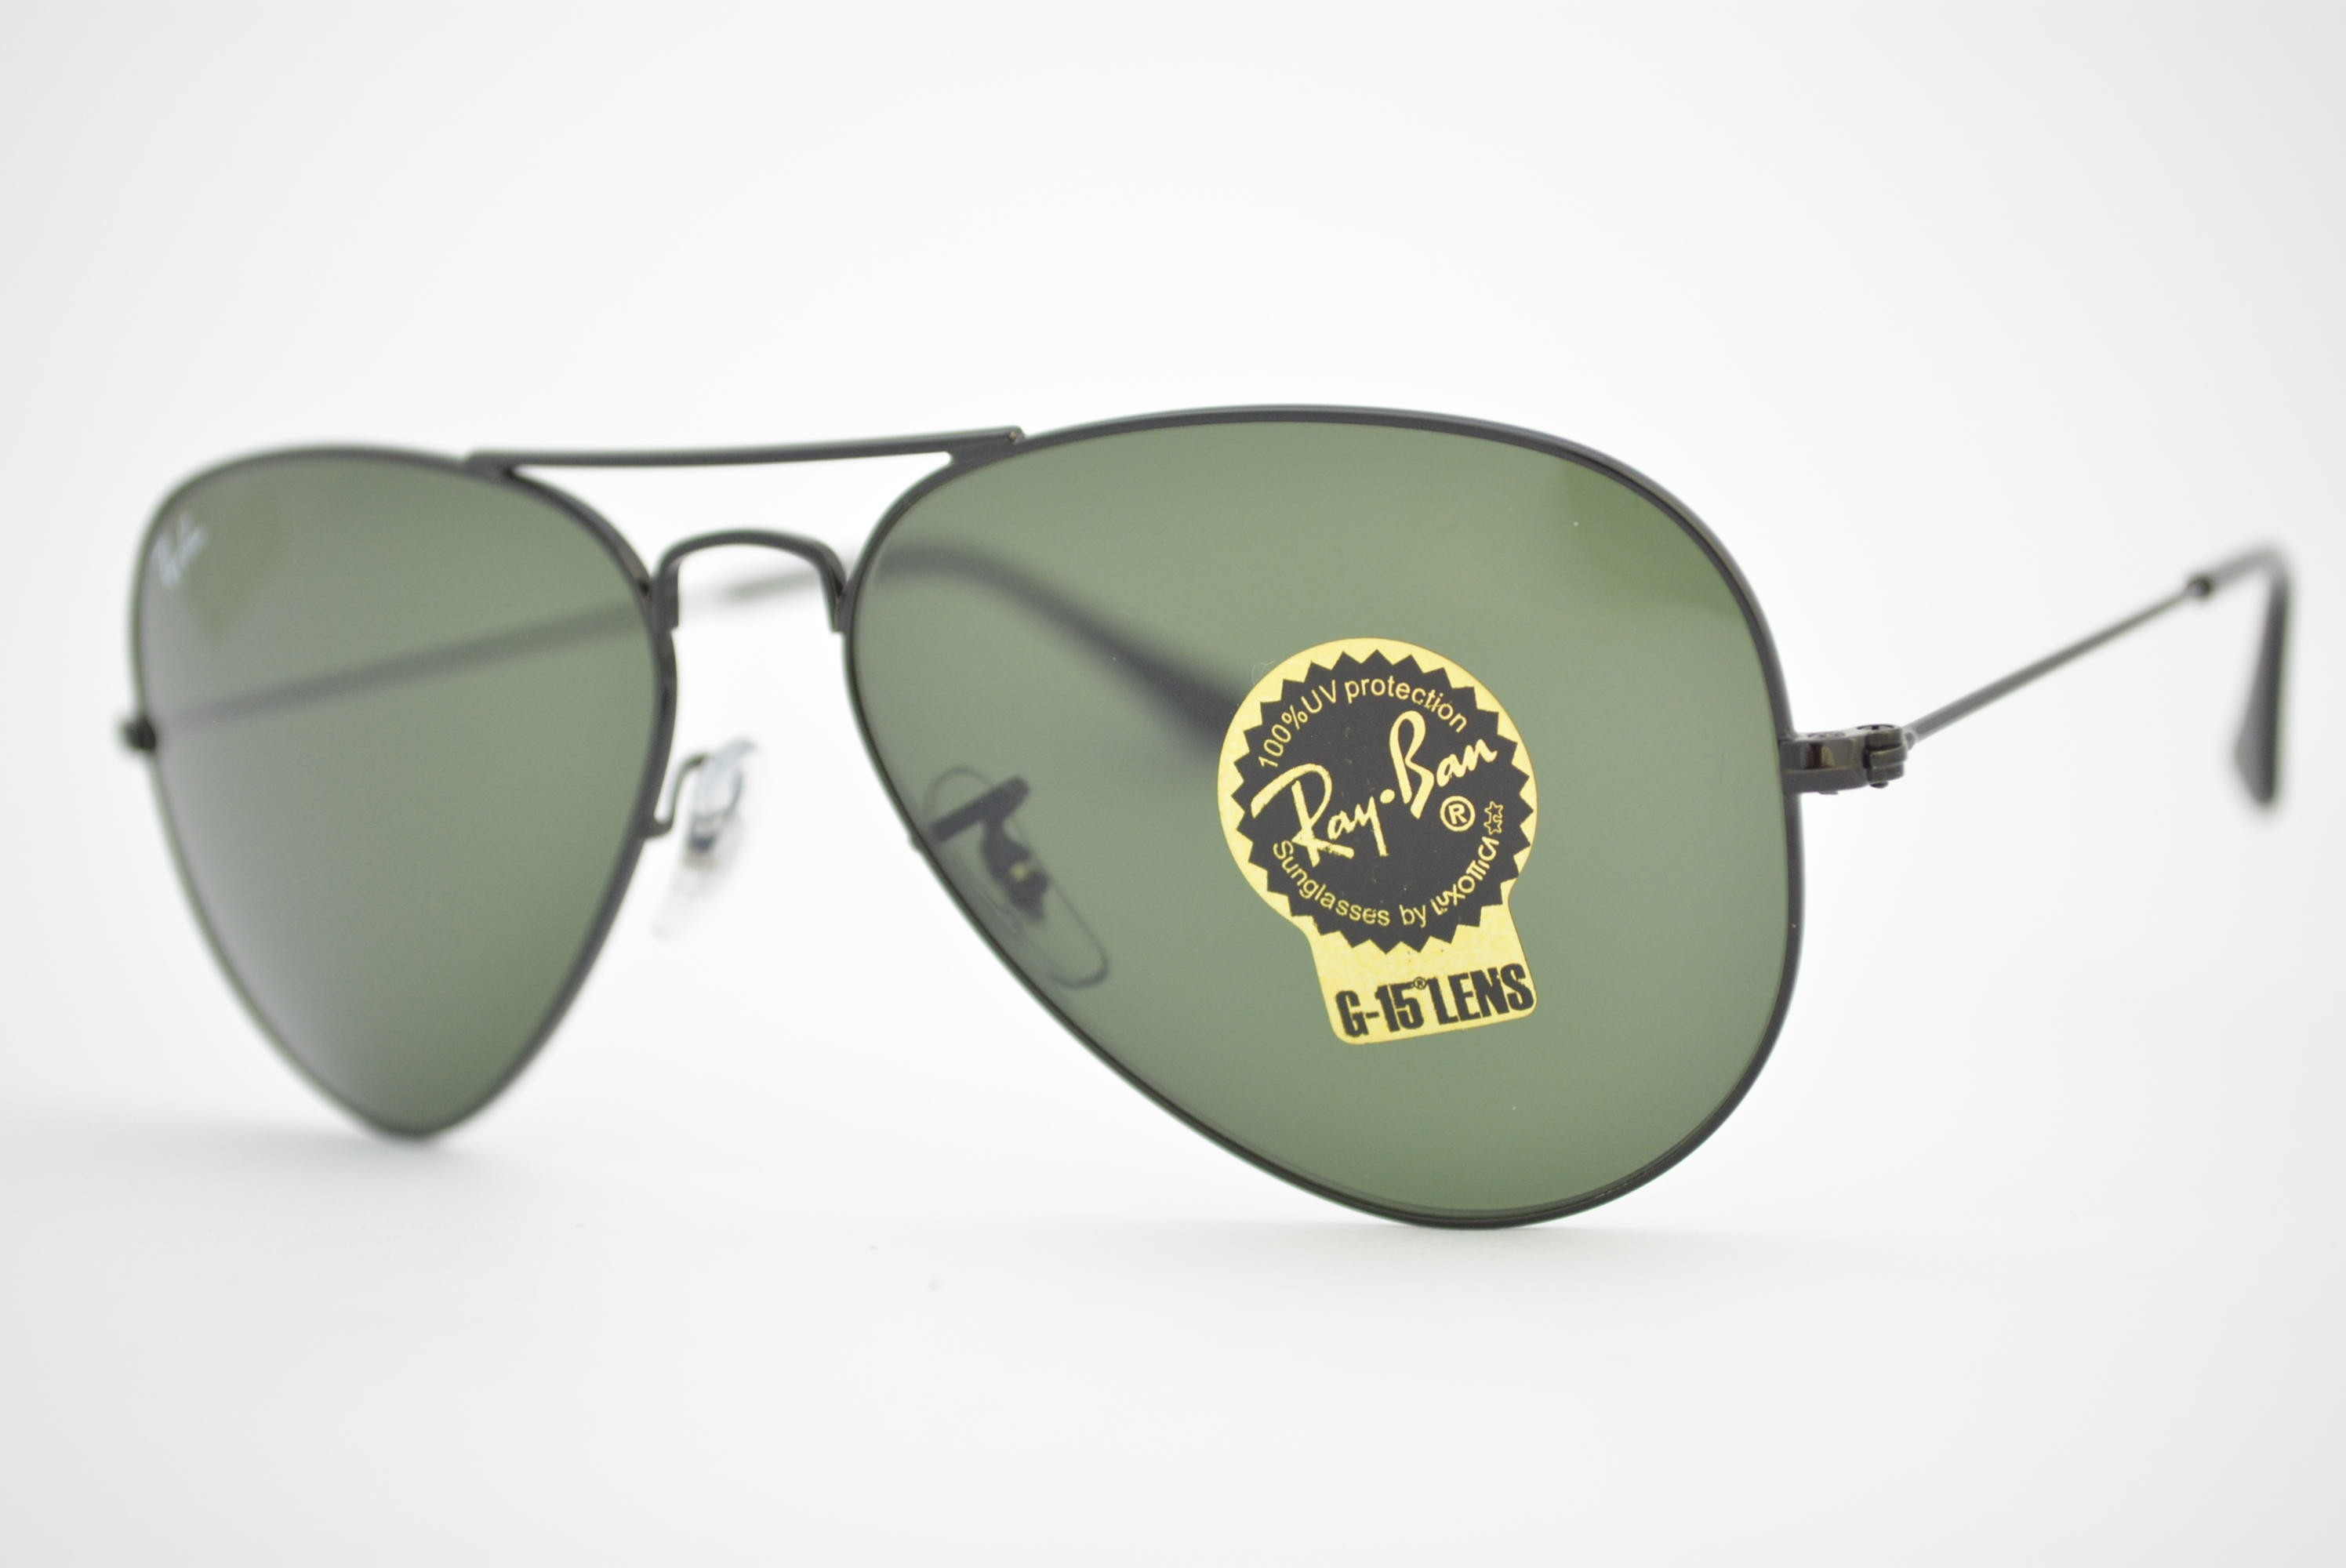 óculos de sol Ray Ban aviator large mod rb3025L L2823 tamanho 58 ... 96ce7f83f1